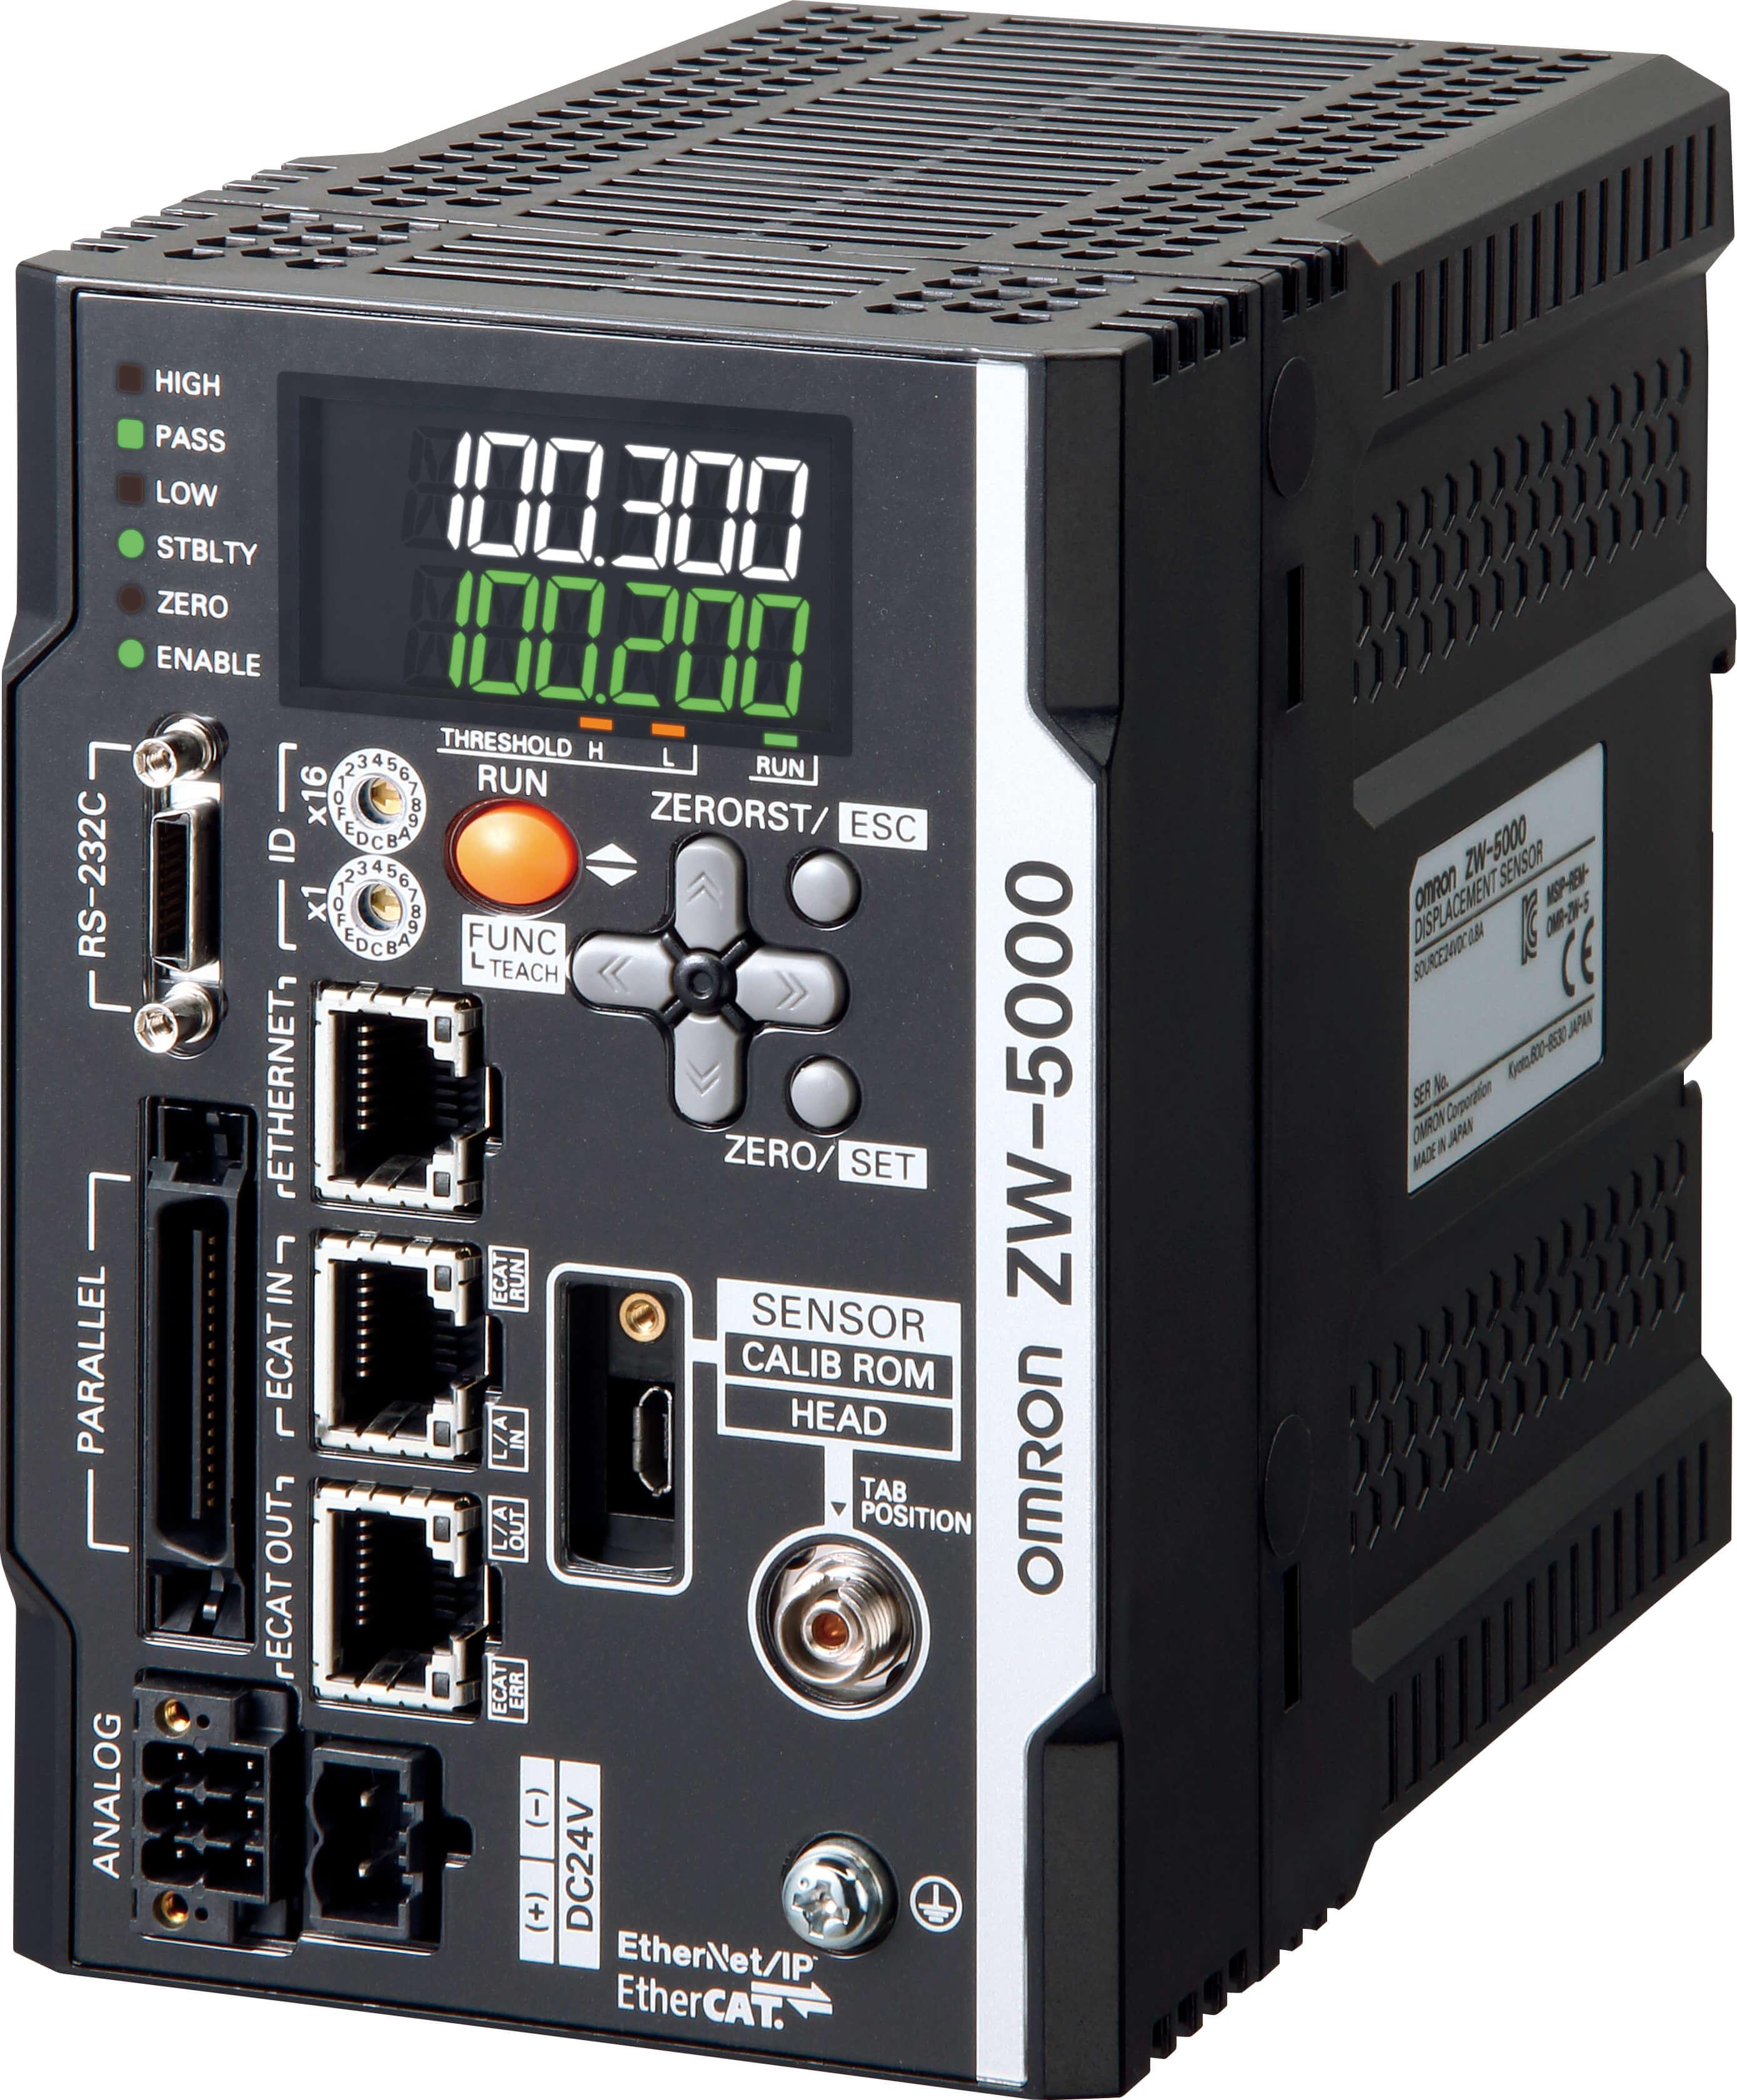 sensor controller zw-5000t prod